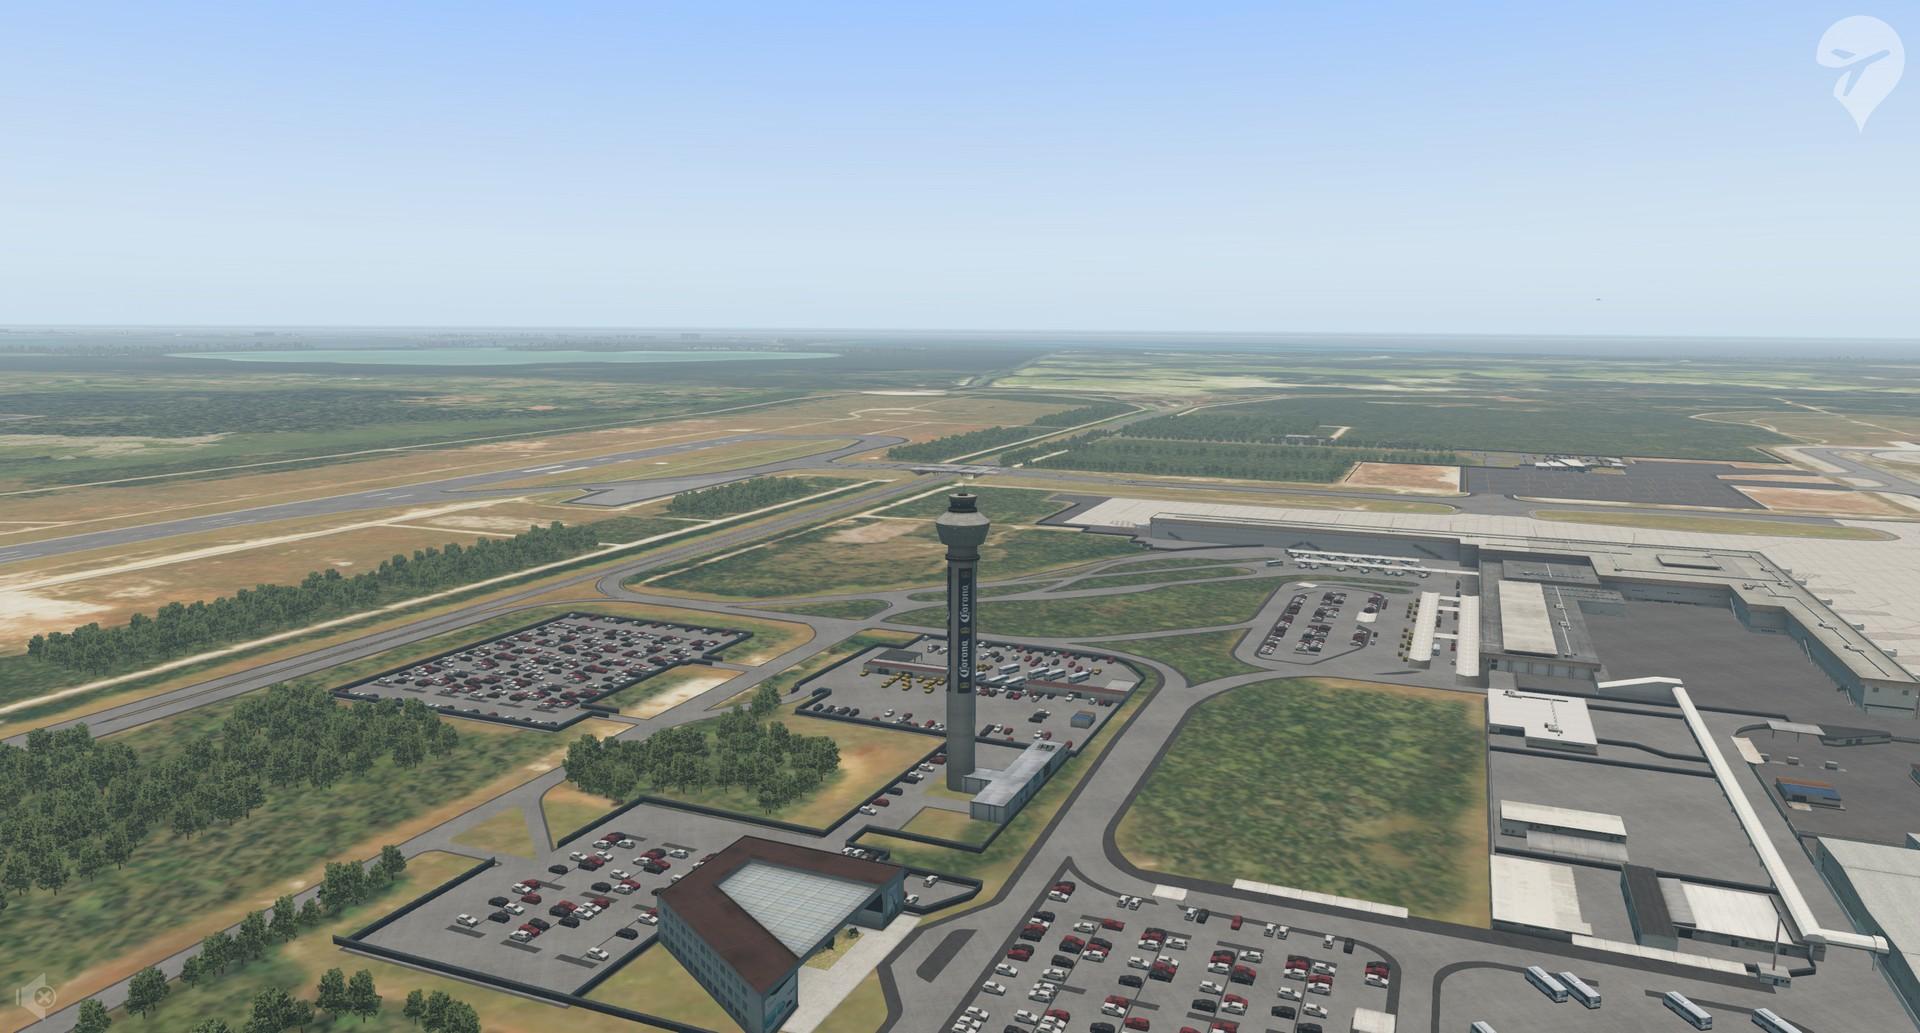 Fsimstudios Windsock Simulations Cancun Xplane 11 08